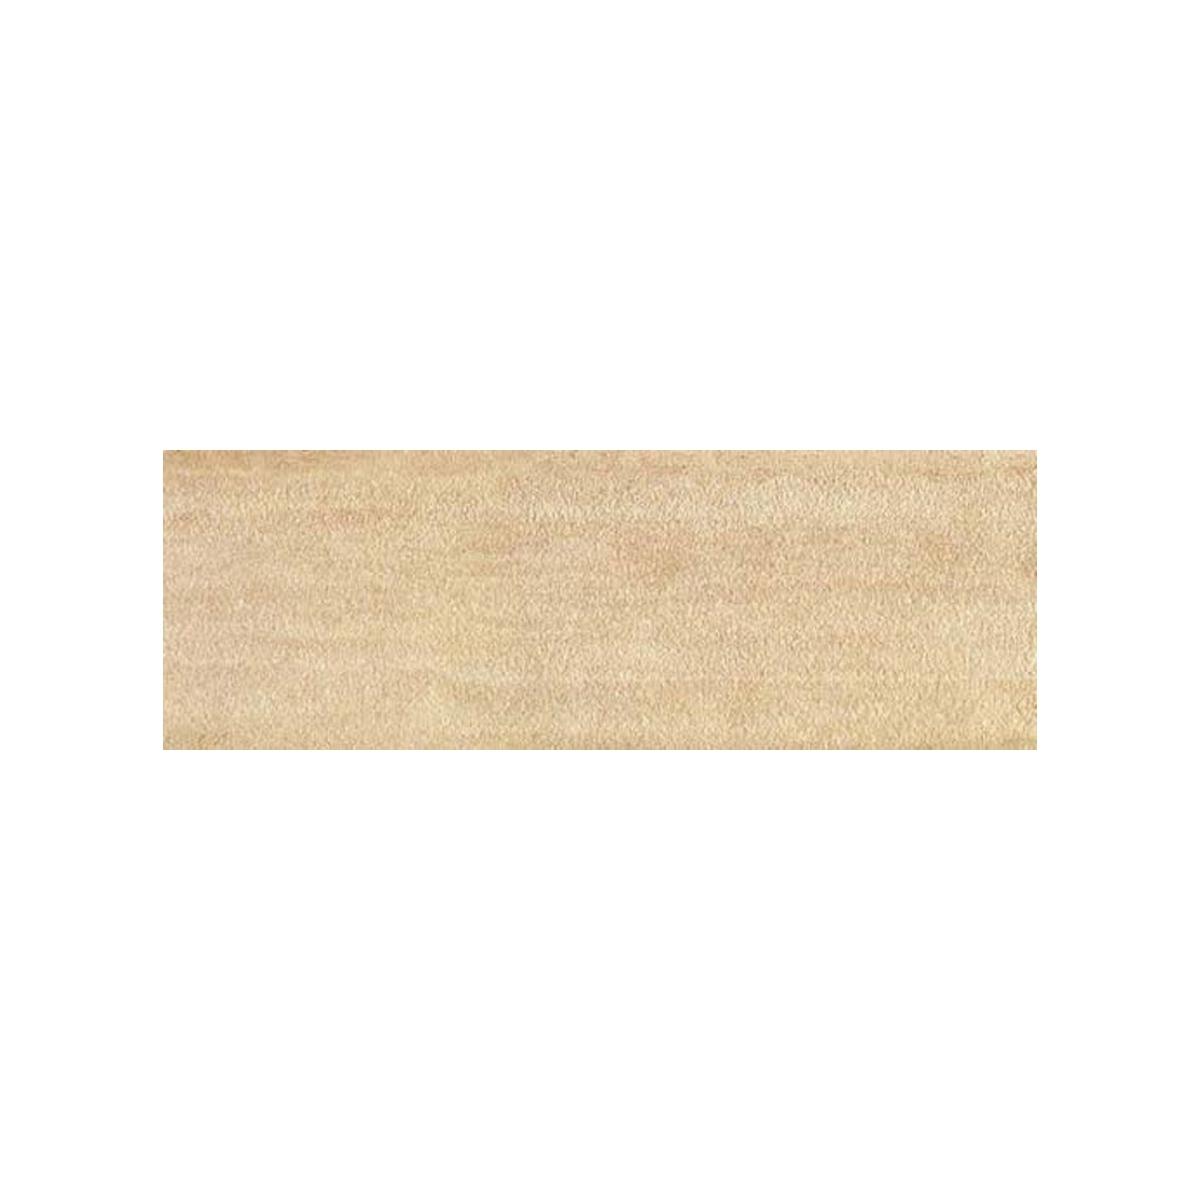 Texturado Kalahari (m2) - Serie Texturado - Marca GrecoGres